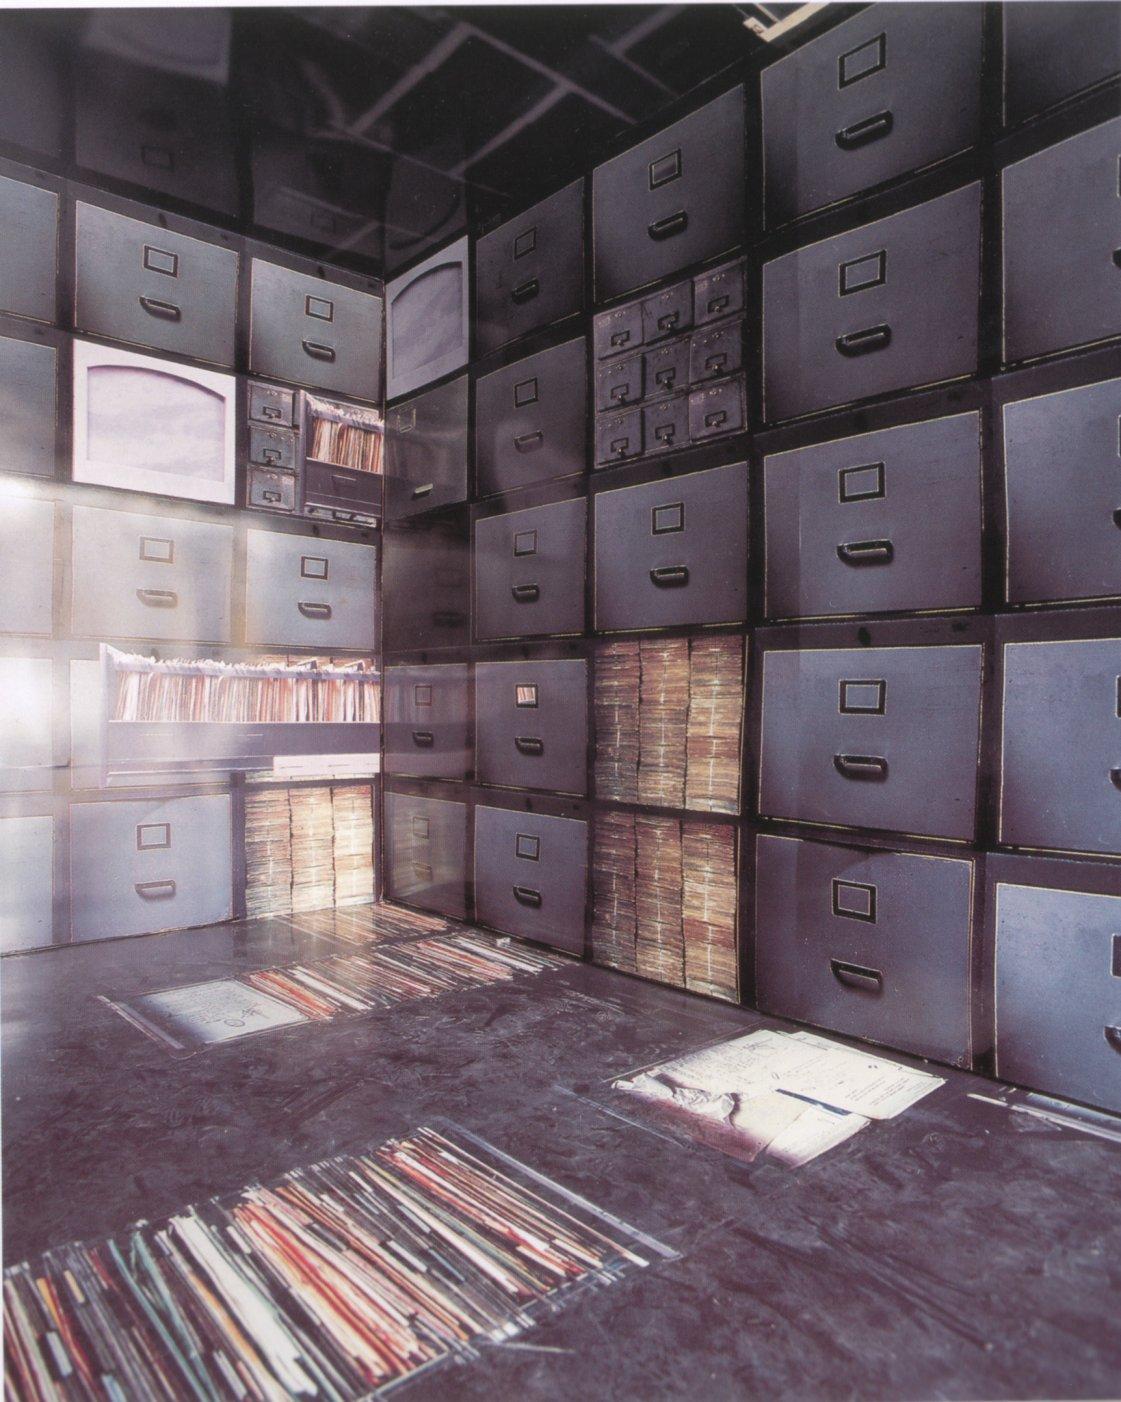 Memorias de un Archivo (2001) - Adriana González Brun